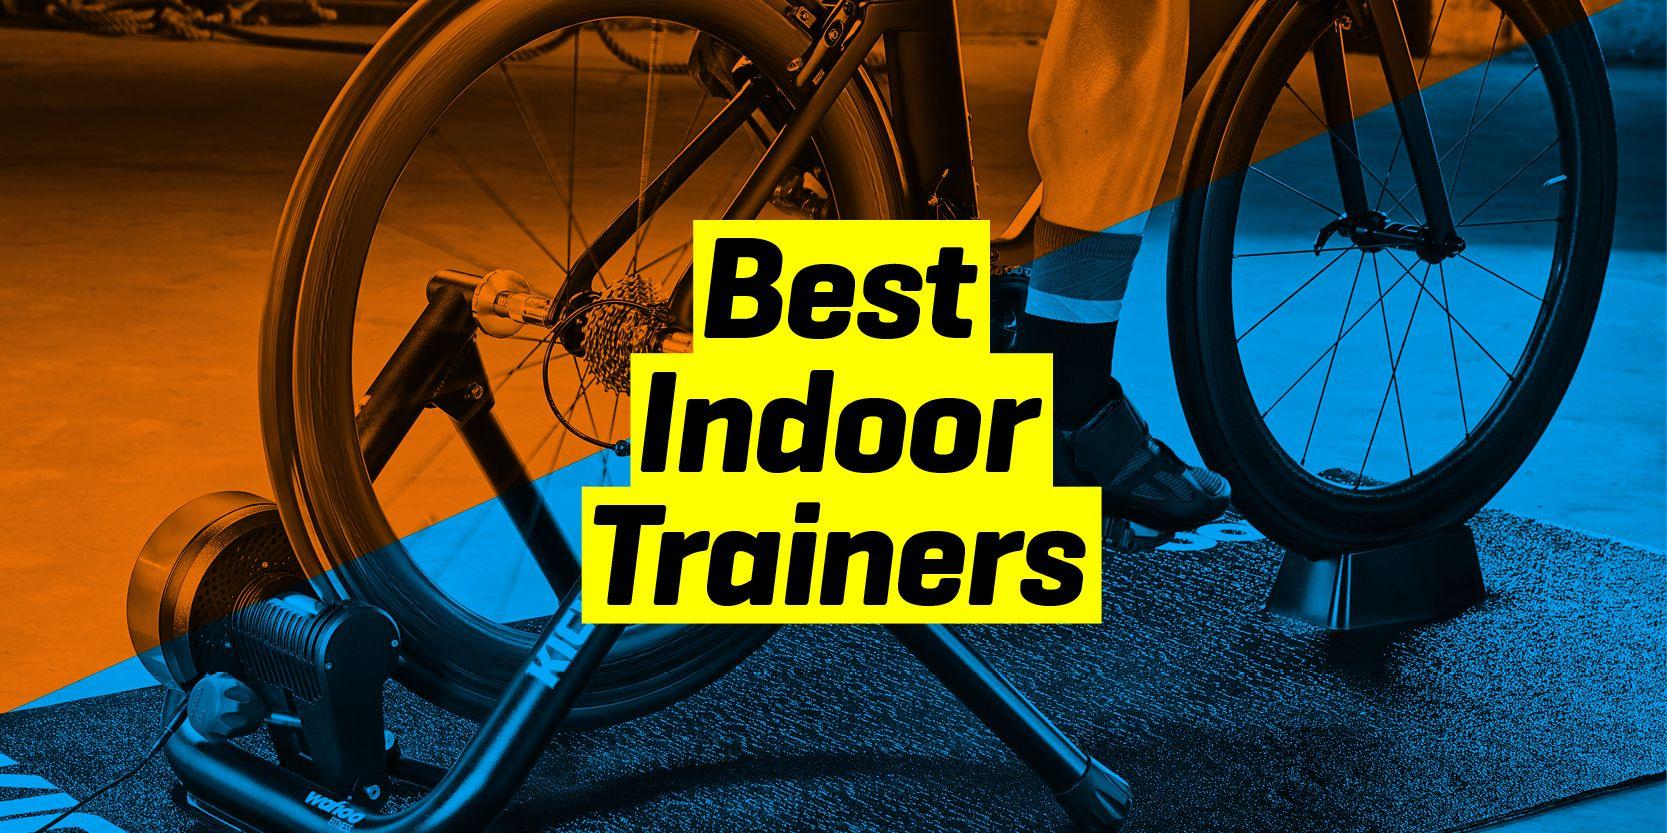 Bike Trainers - Best Indoor Bike Trainers 2018